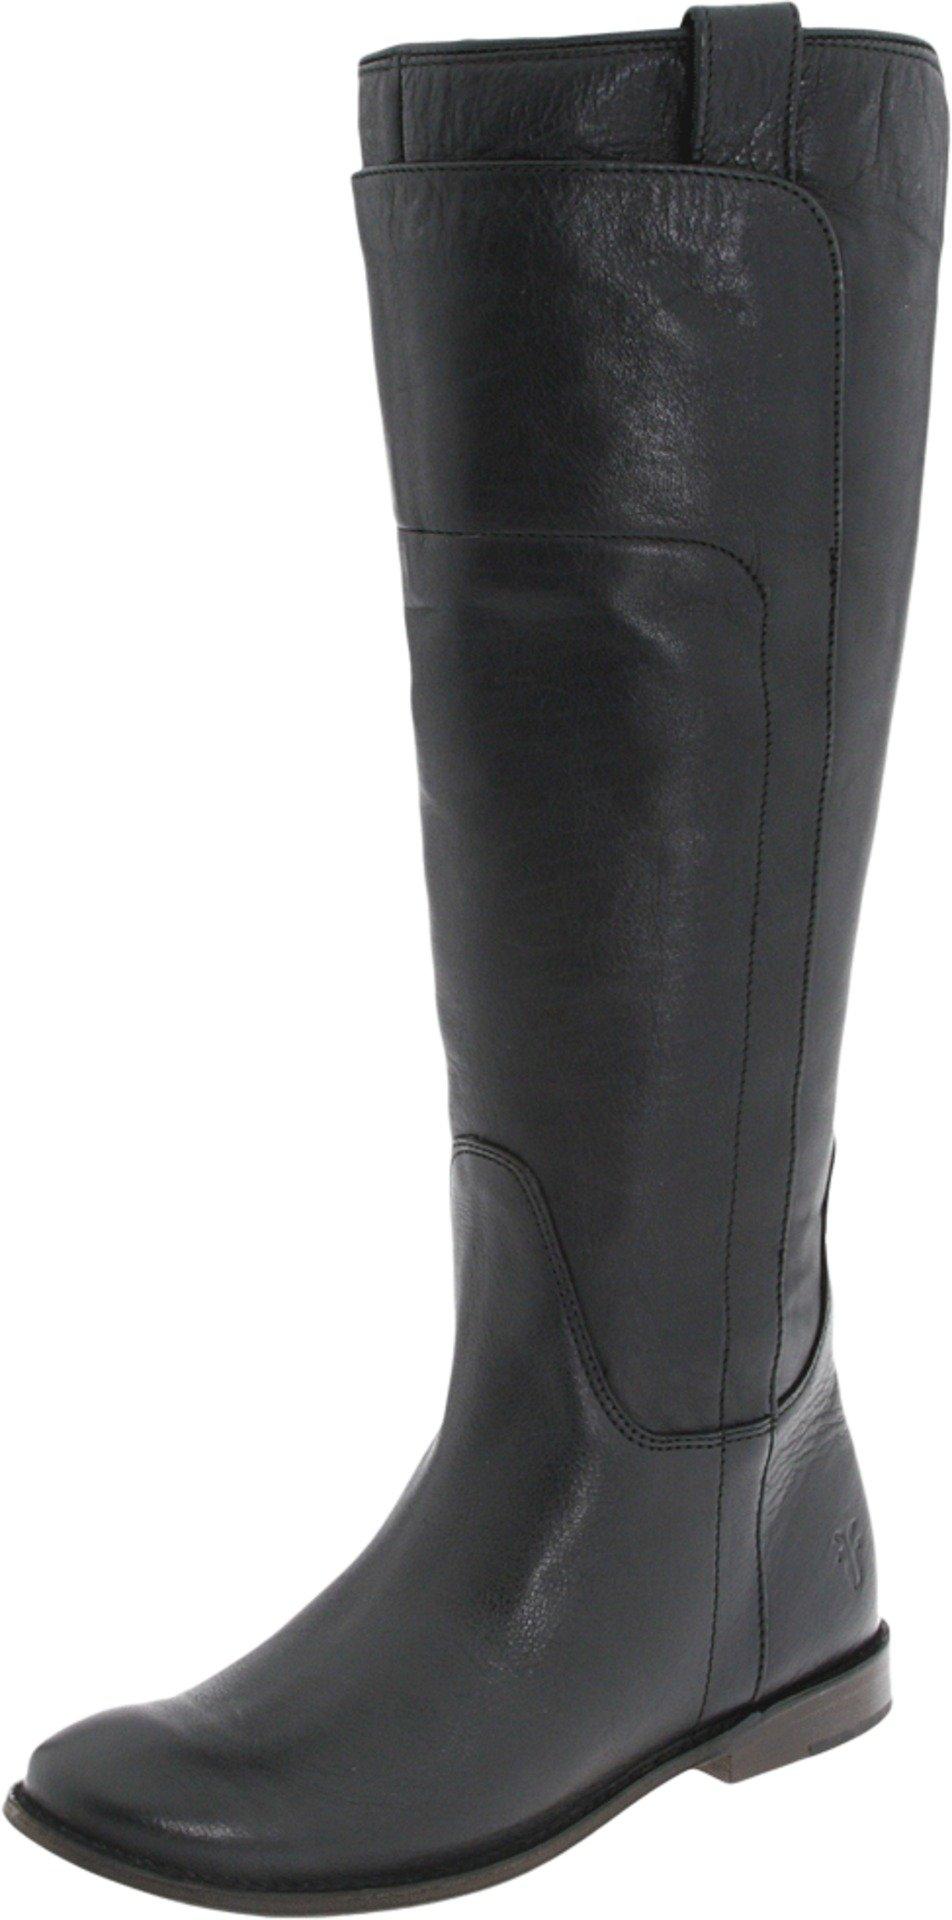 FRYE Women's Paige Tall Riding Boot, Black Calf Shine, 6 M US